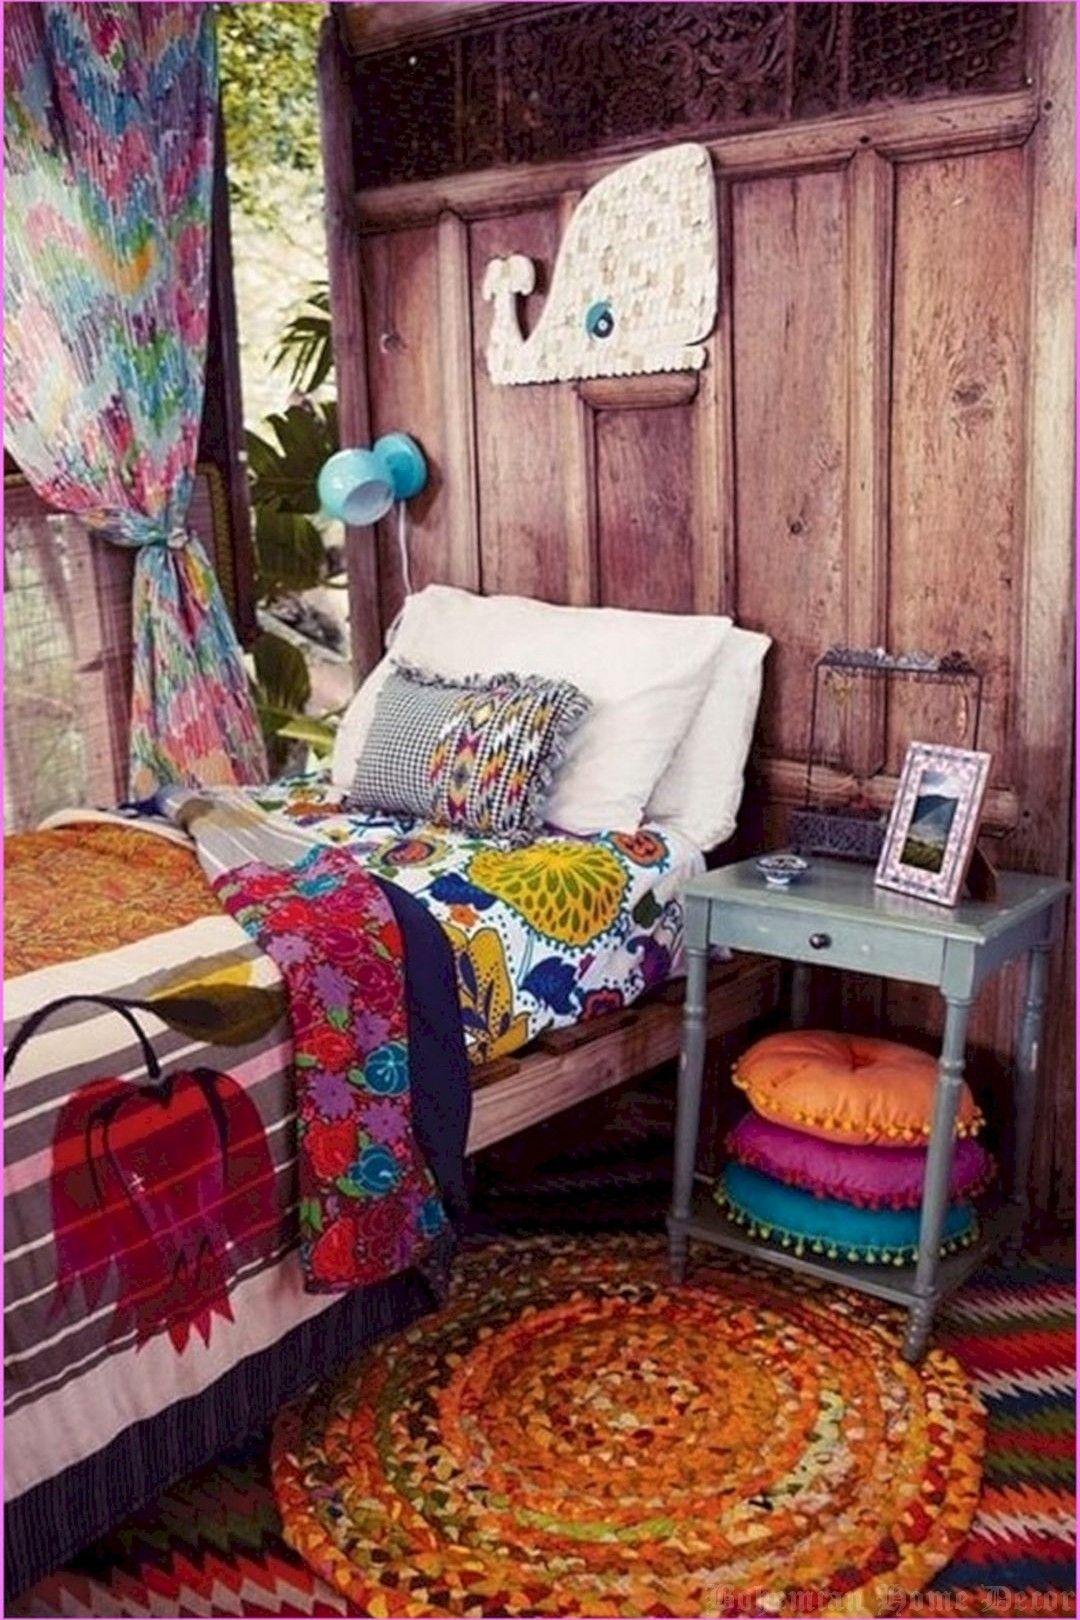 Bohemian Home Decor – The Six Figure Challenge